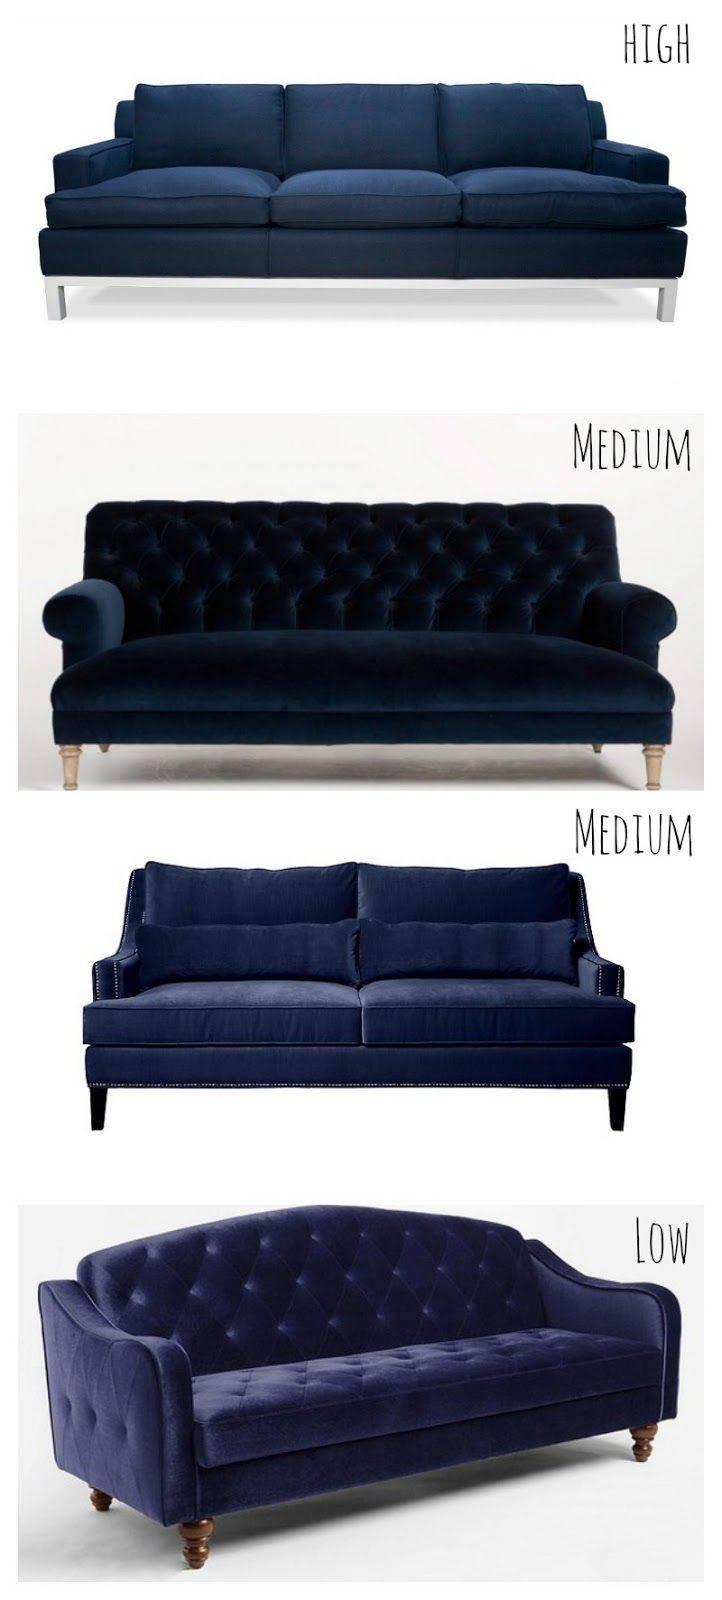 Best 25+ Blue Sofas Ideas On Pinterest | Sofa, Navy Blue Couches regarding Blue Tufted Sofas (Image 1 of 30)